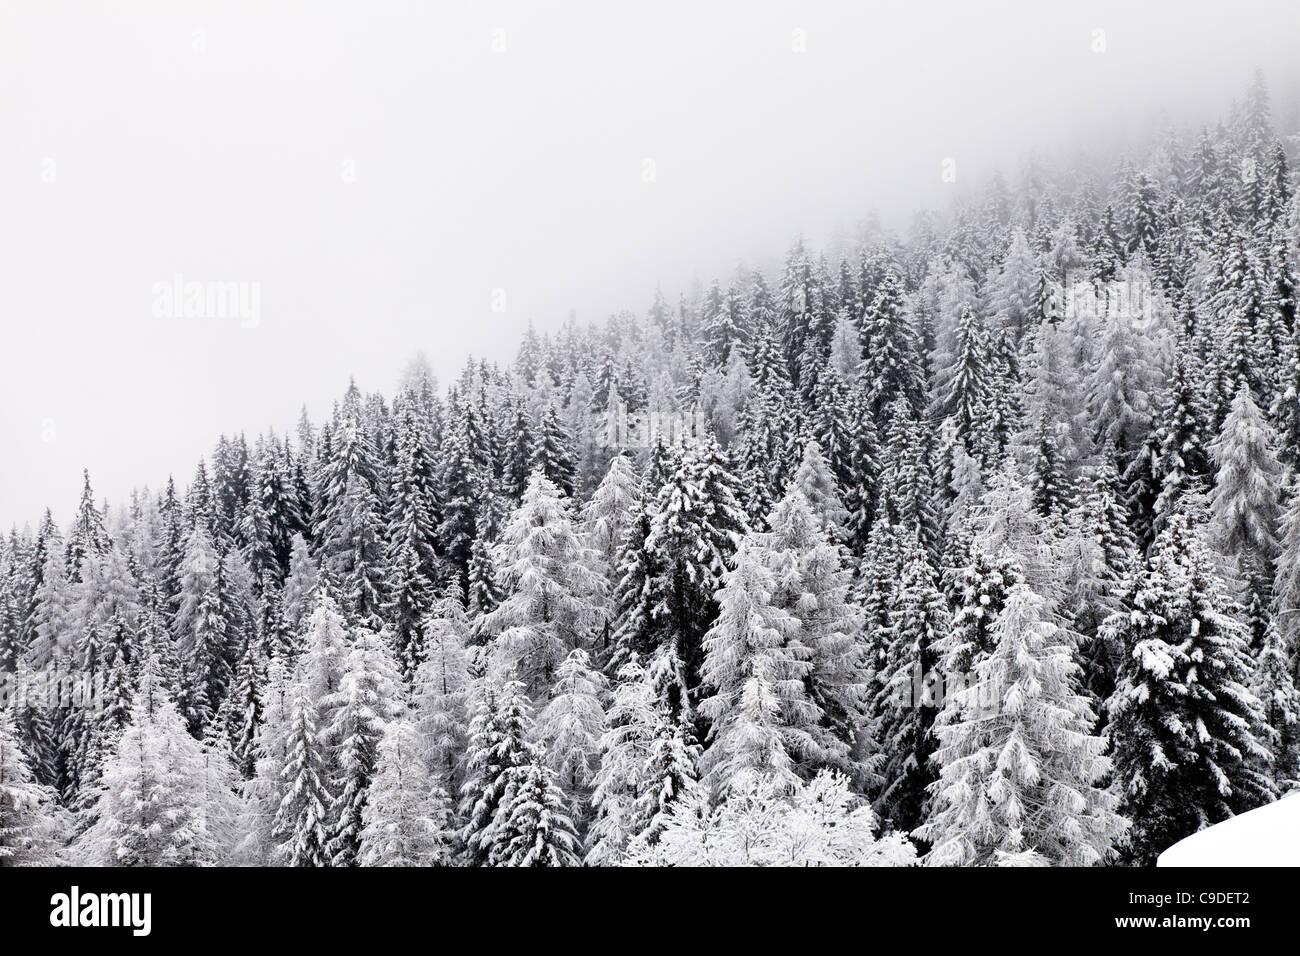 Schneebedeckte Kiefern am Hang Hang mit monochromen Nebel Stockbild